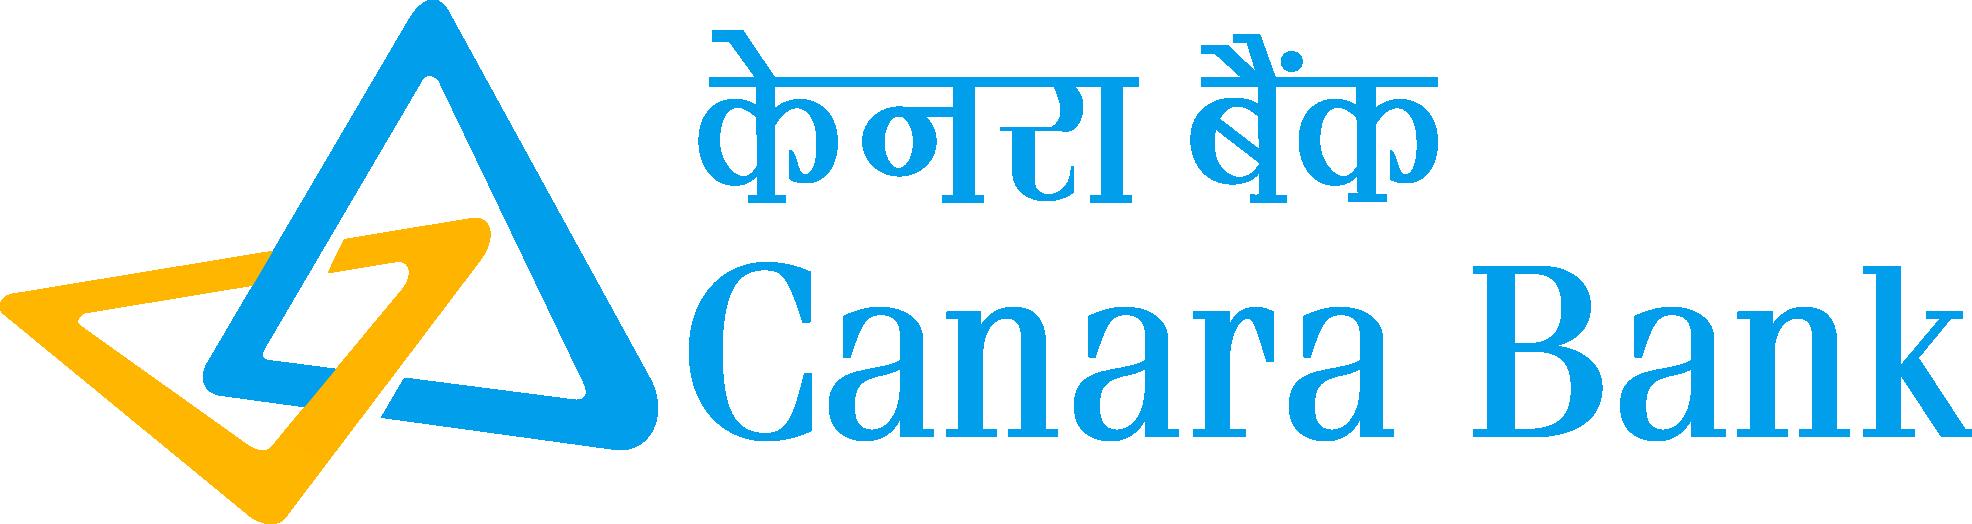 Canara Bank Logo Png Image Banks Logo Logos Credit Card